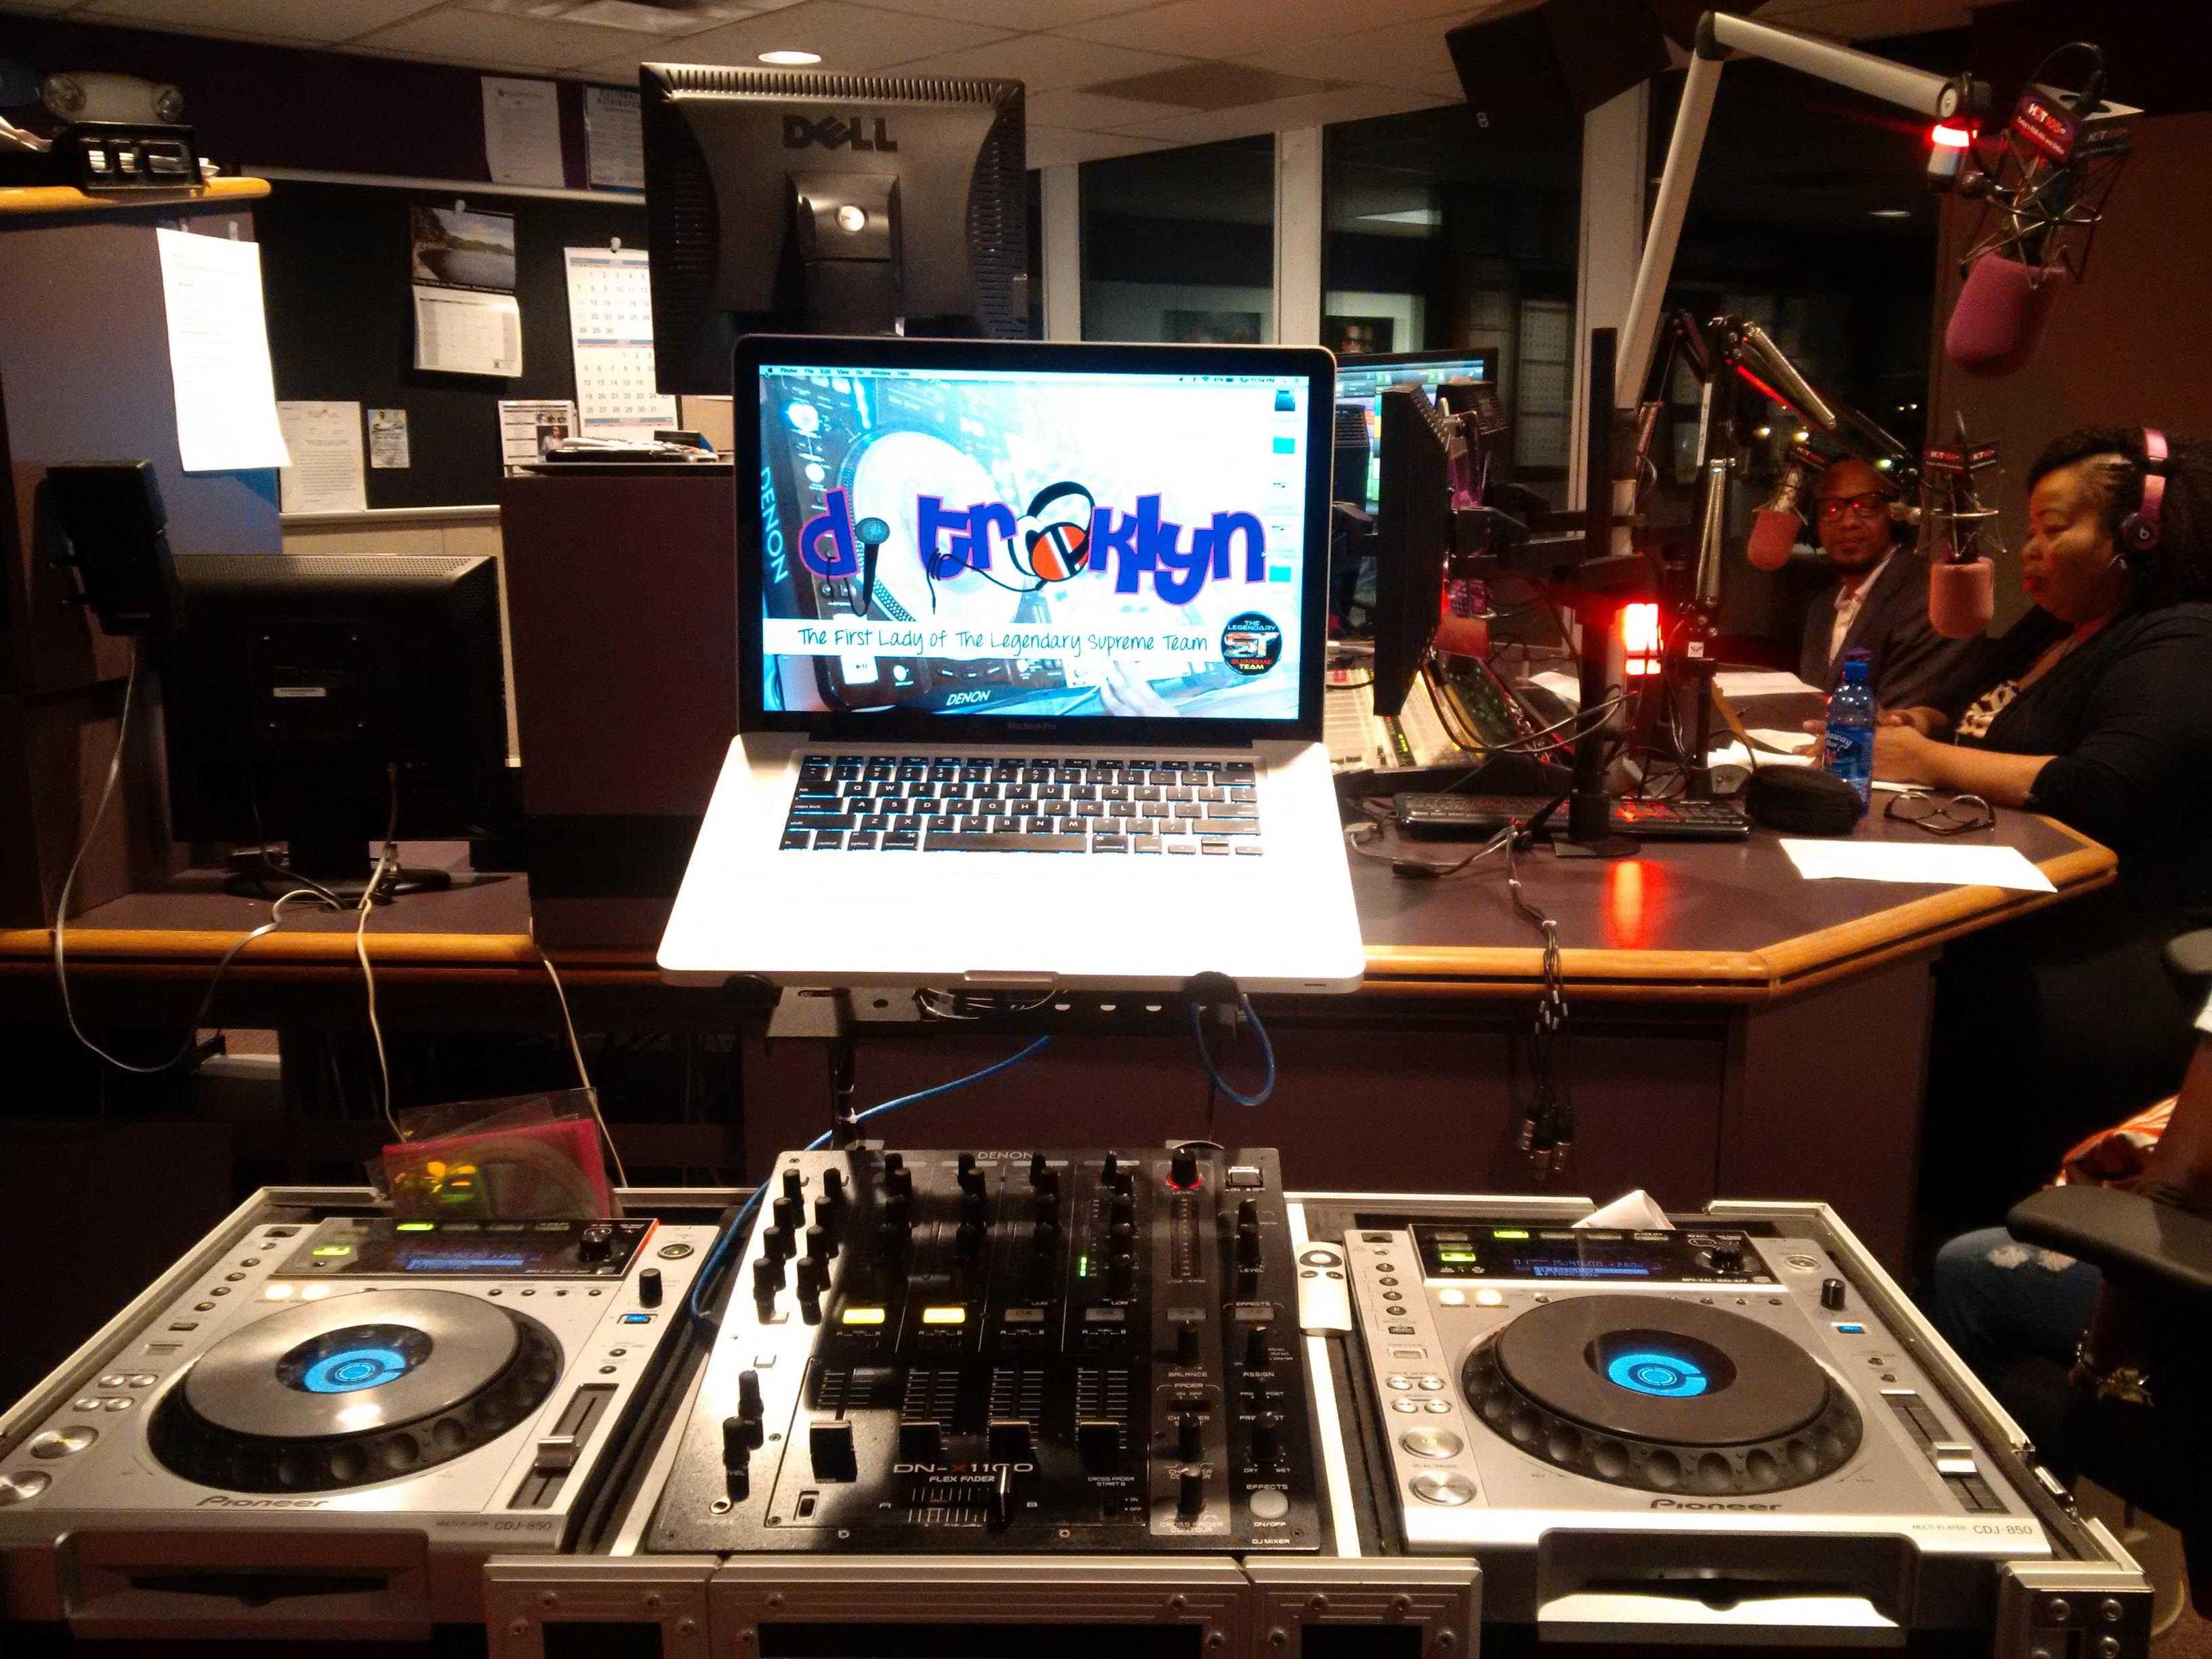 Hot 105.1 FM